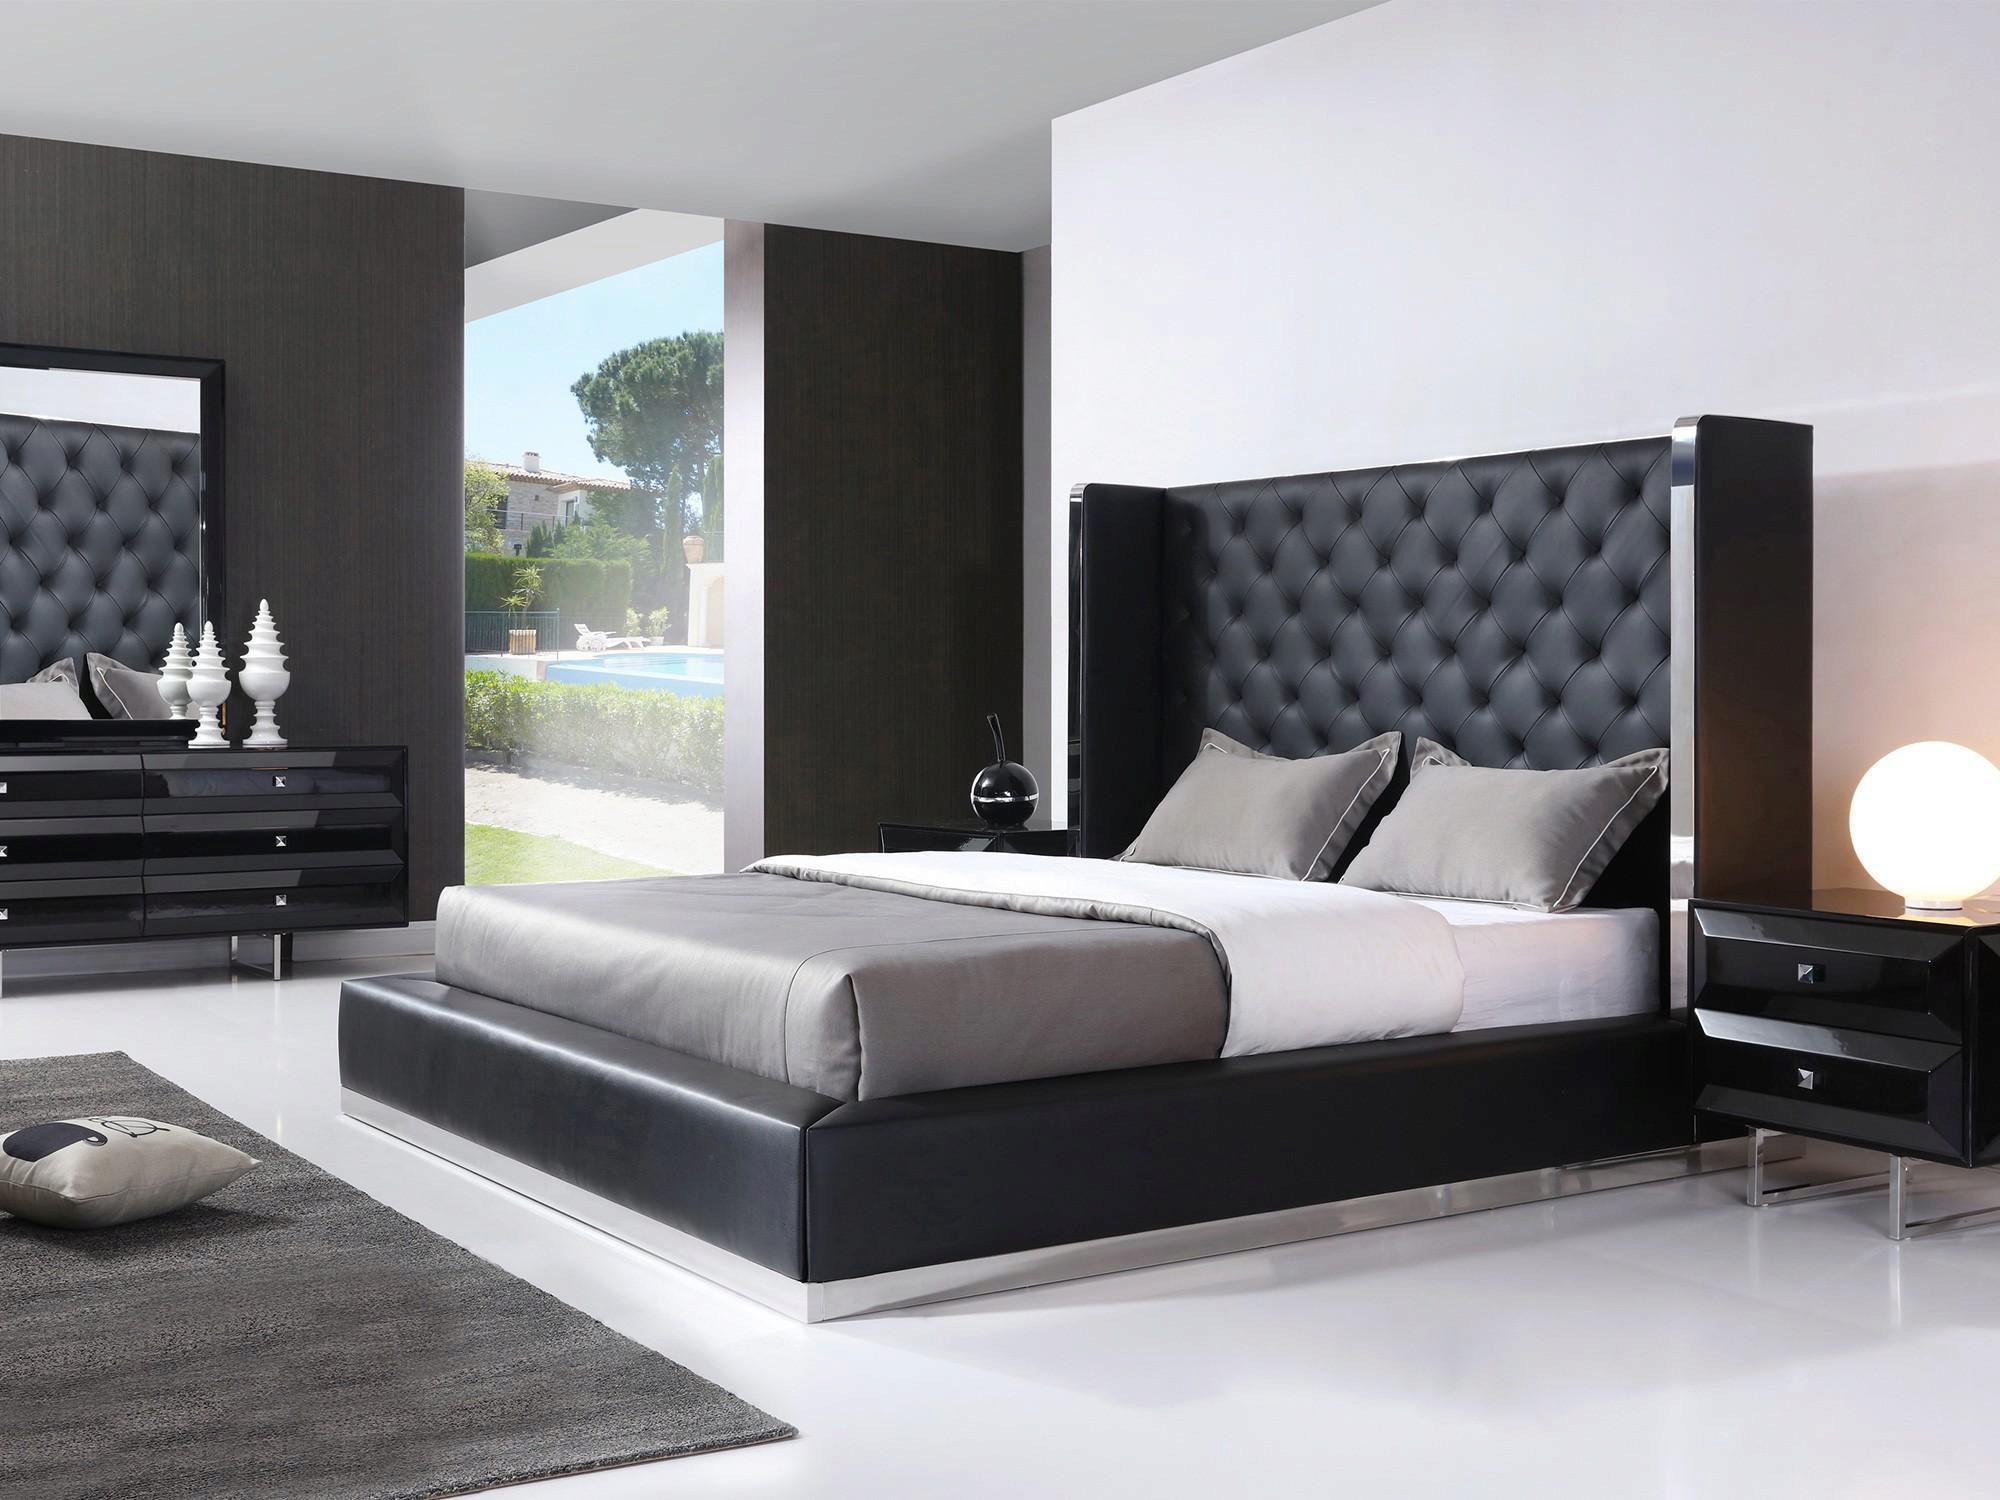 Button Tufted Tall Hb Platform Aesara King Bedroom Set 5pcs Contemporary Modern Aesara Ek Bed Set 5